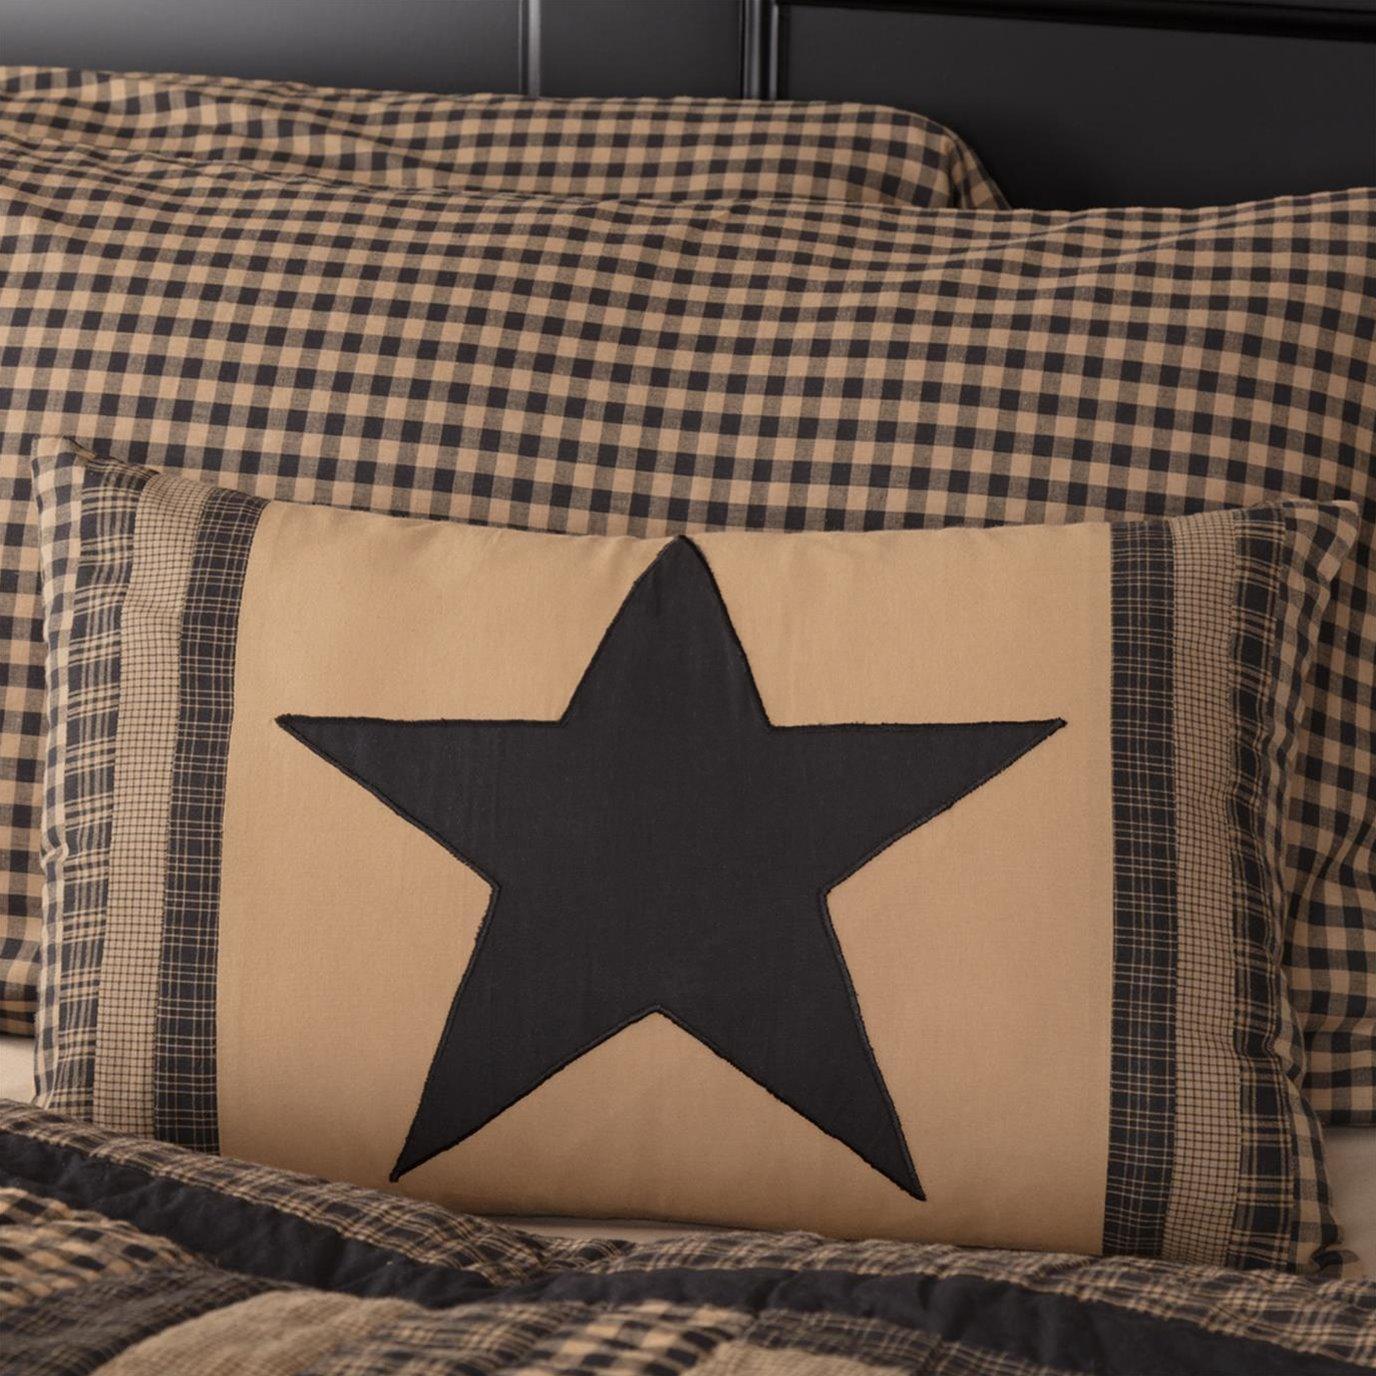 Black Check Star Patch Pillow 14x22